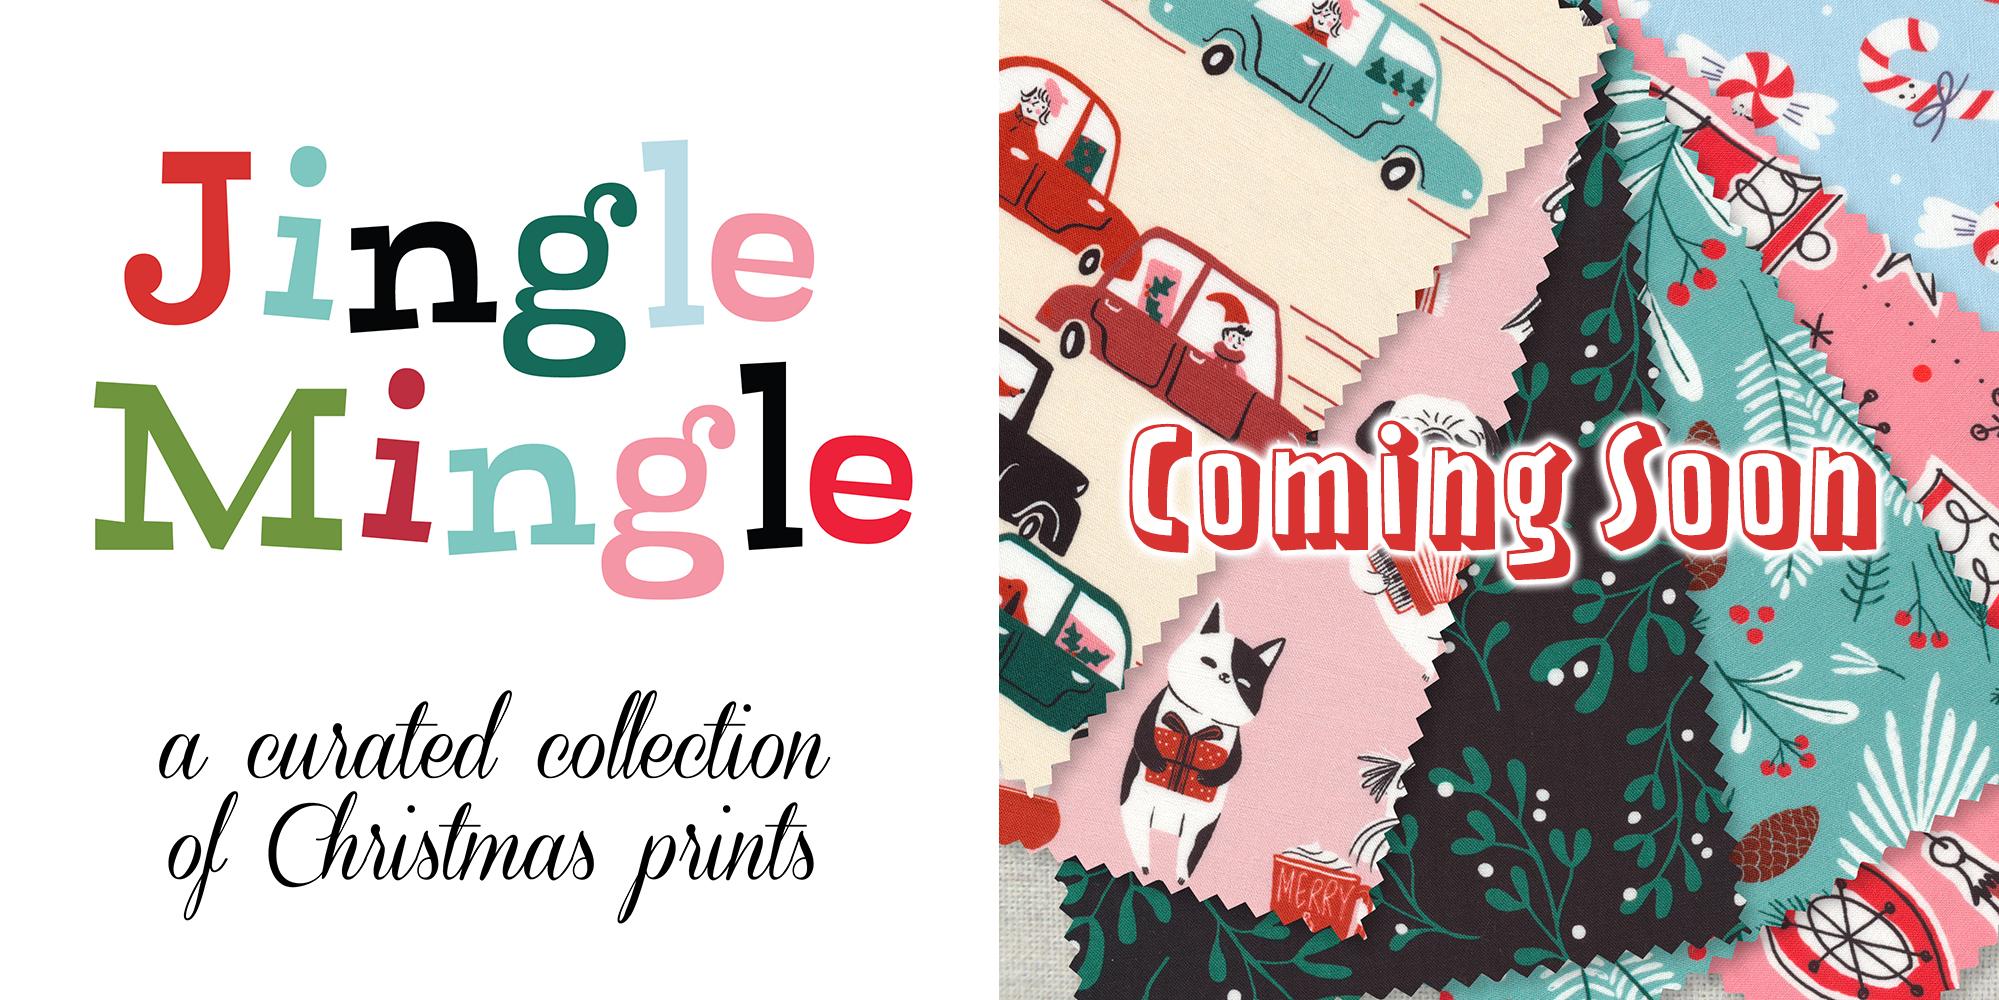 Cloud9 Fabrics Jingle Mingle a Curated Collection